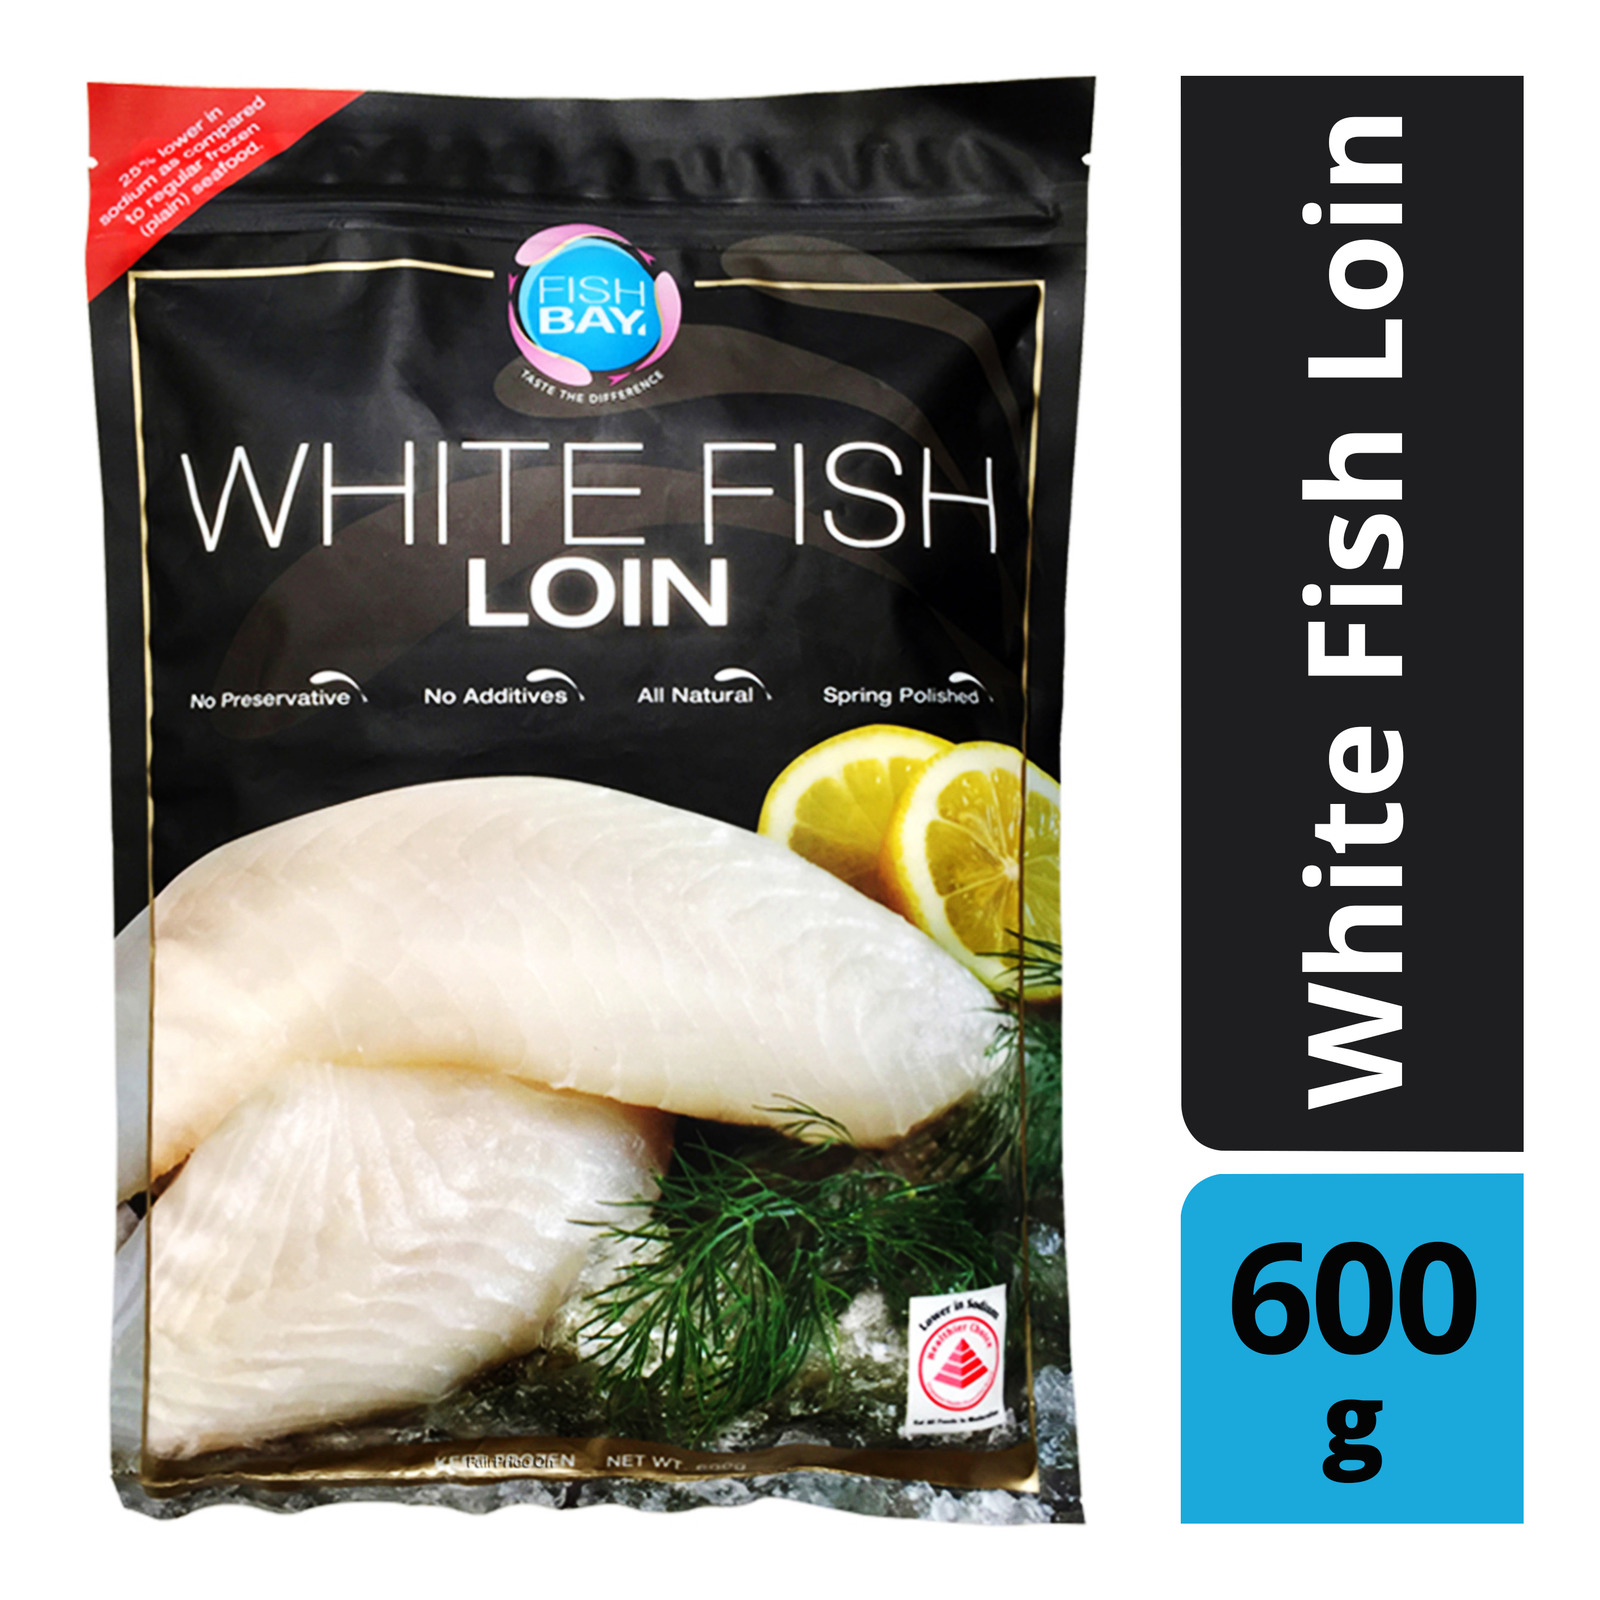 Fish Bay Frozen White Fish Loin Ntuc Fairprice